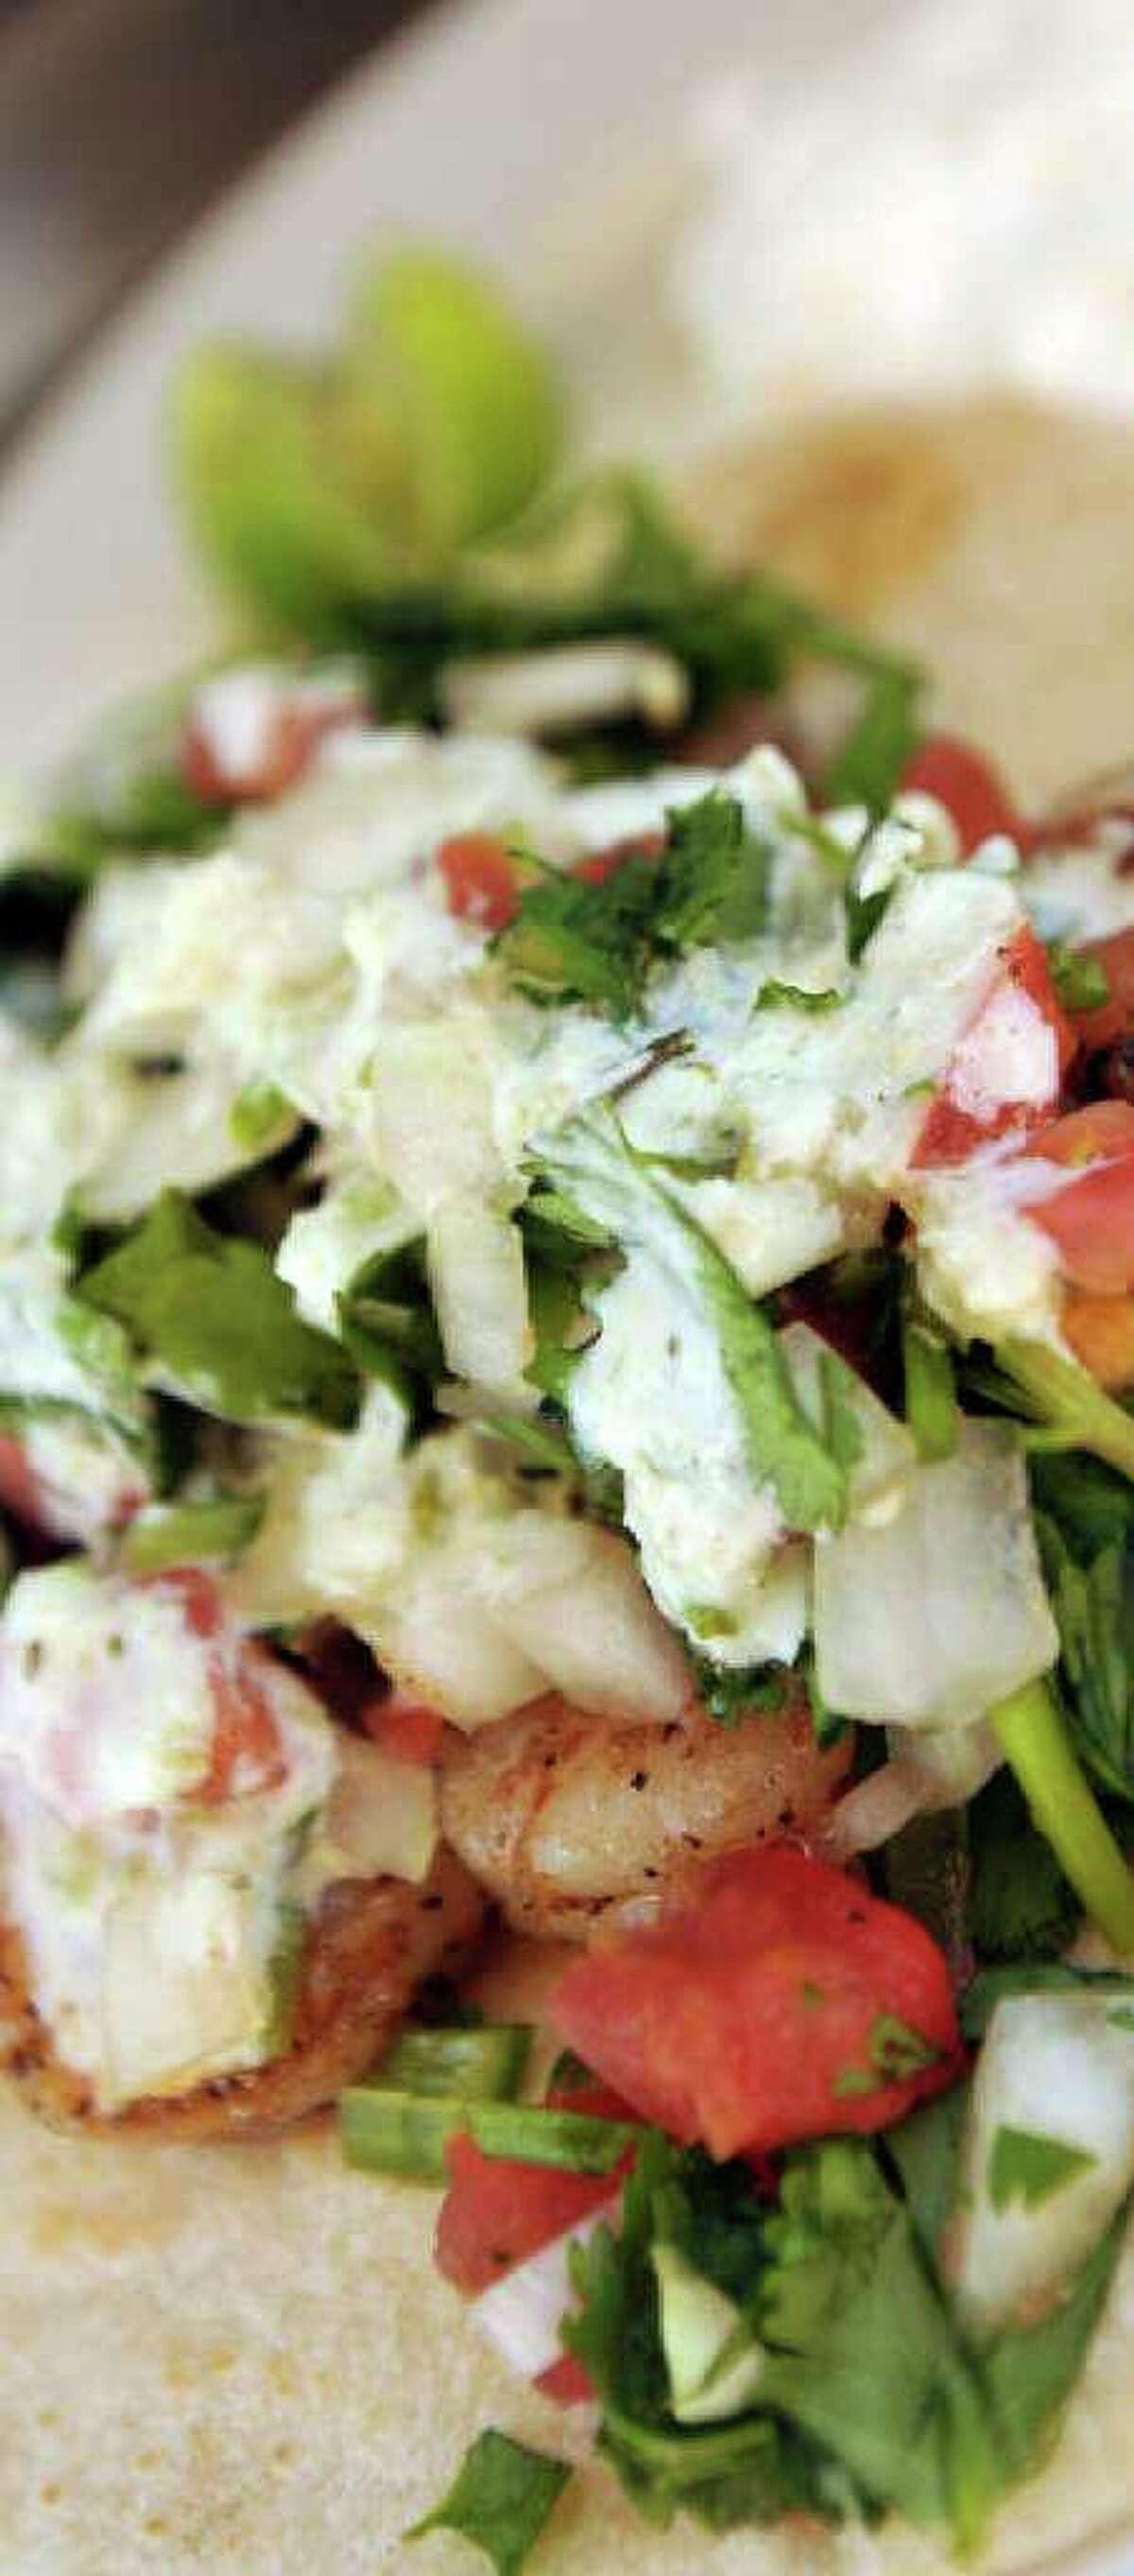 Shrimp tacos are a favorite from Chela's Tacos.